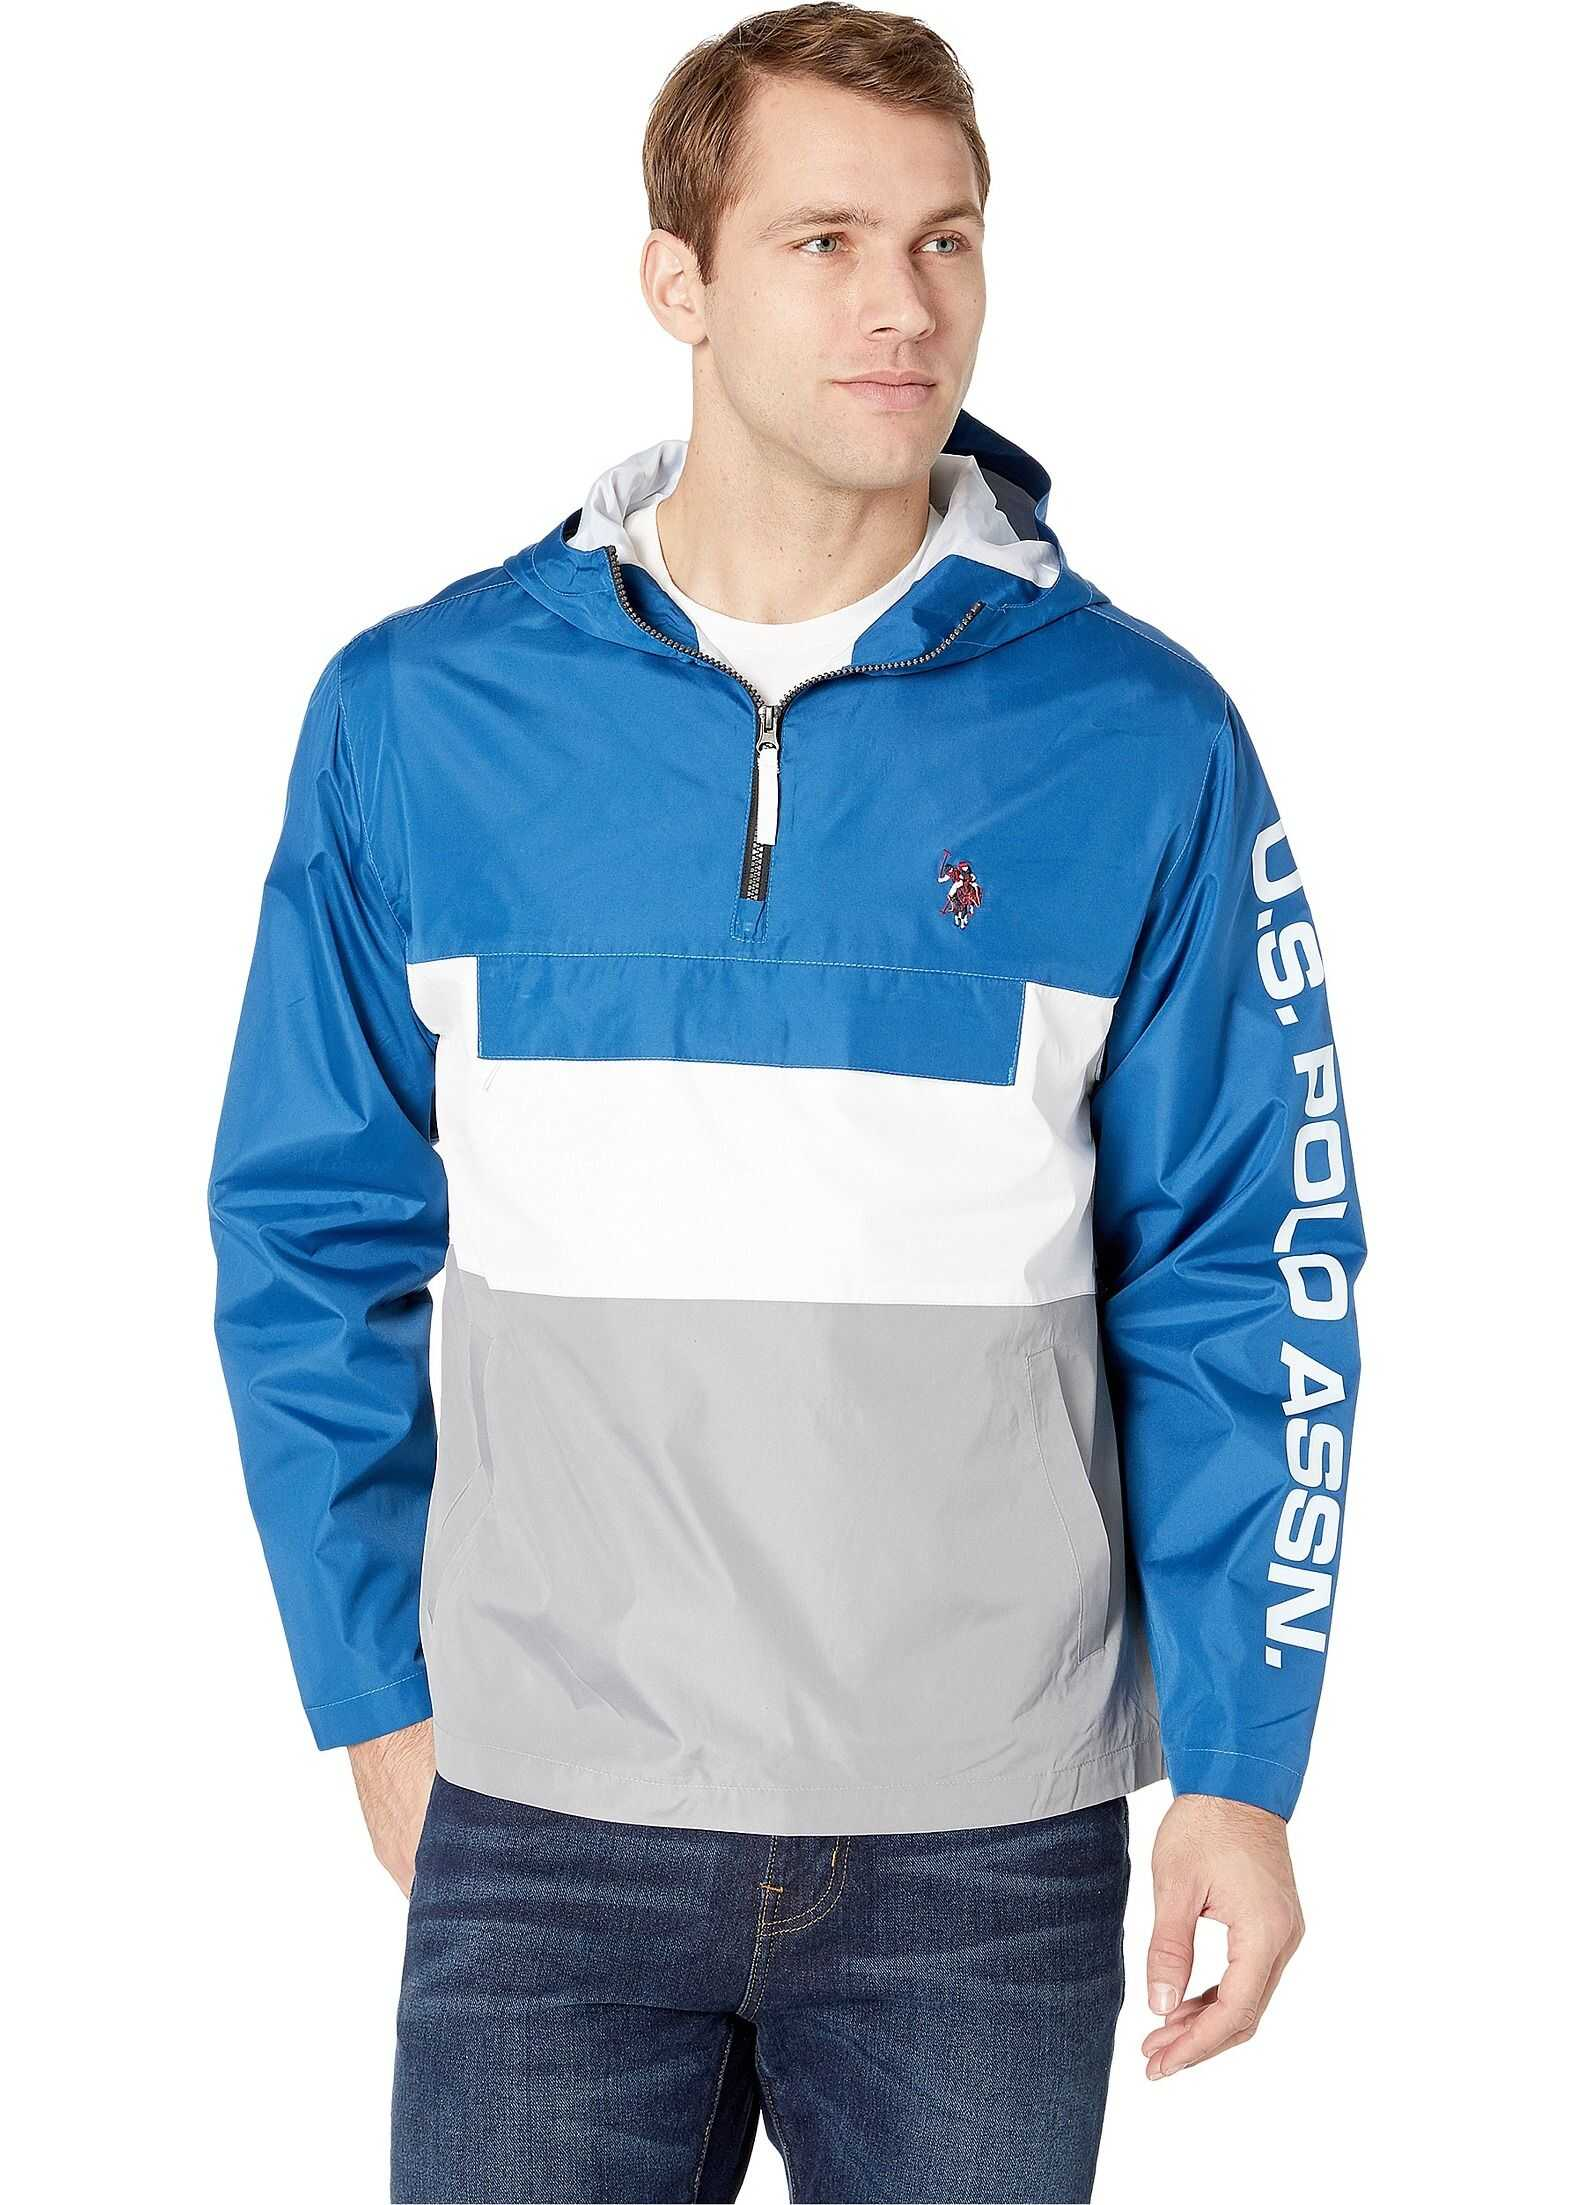 U.S. POLO ASSN. Color Block Windbreaker Blue/White